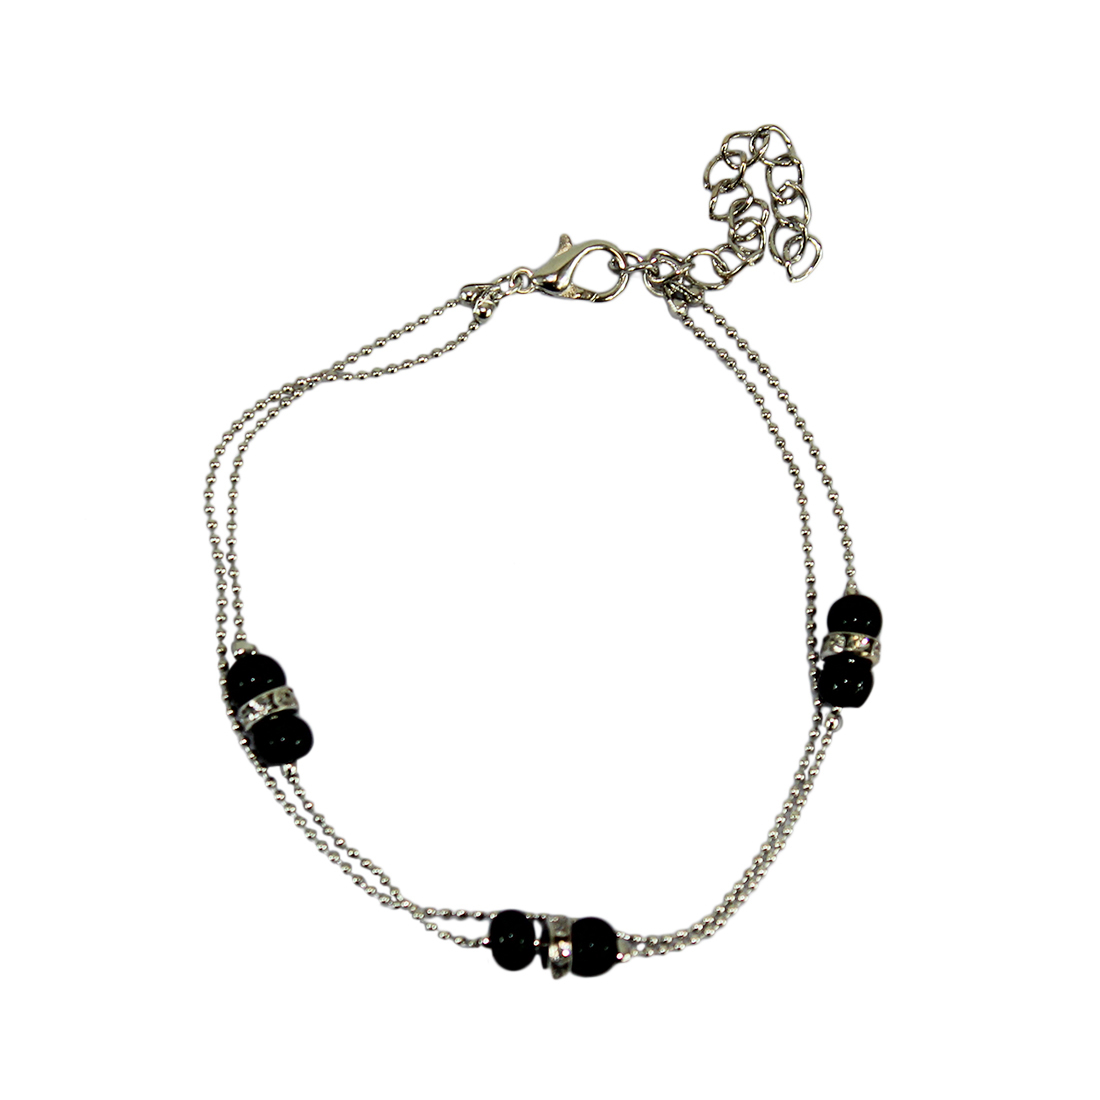 * Black Beads Chain Design